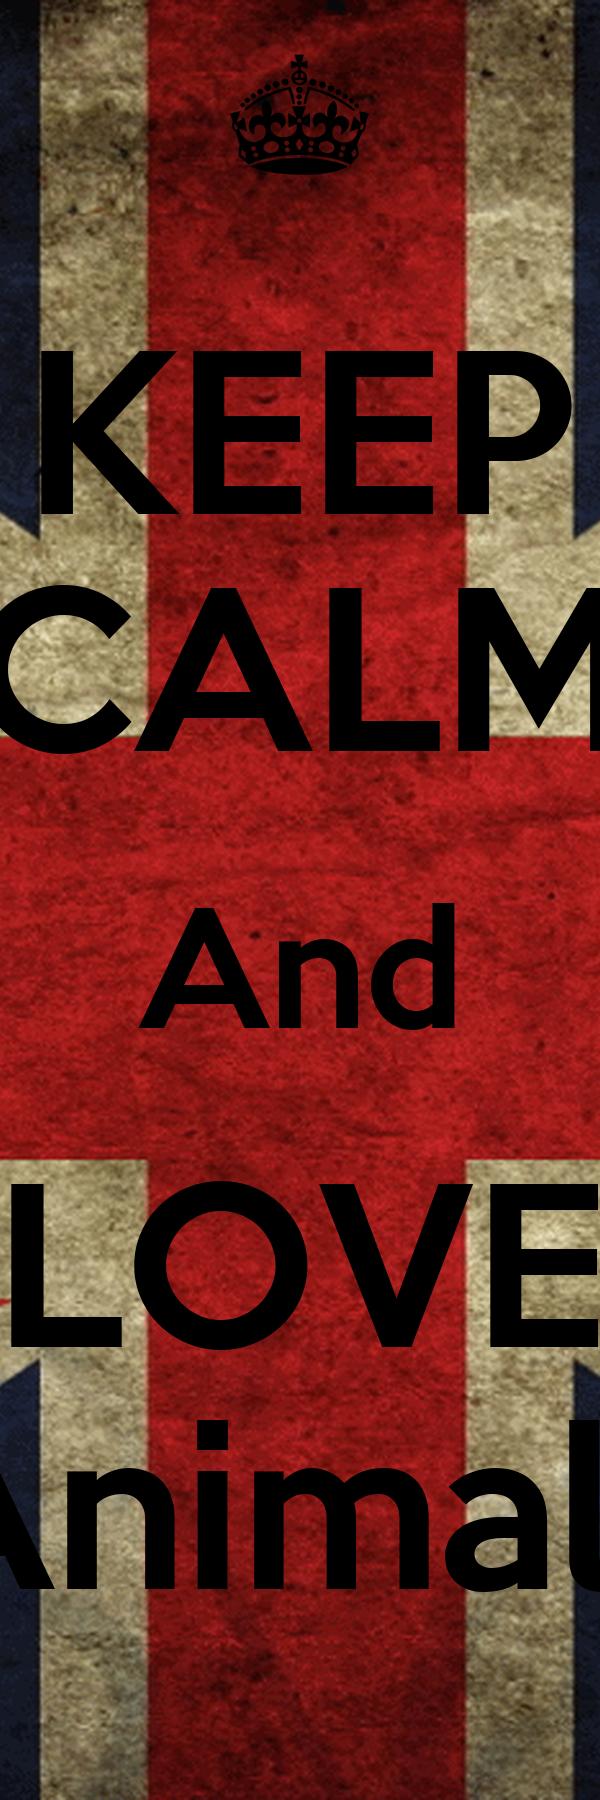 KEEP CALM And LOVE Animals